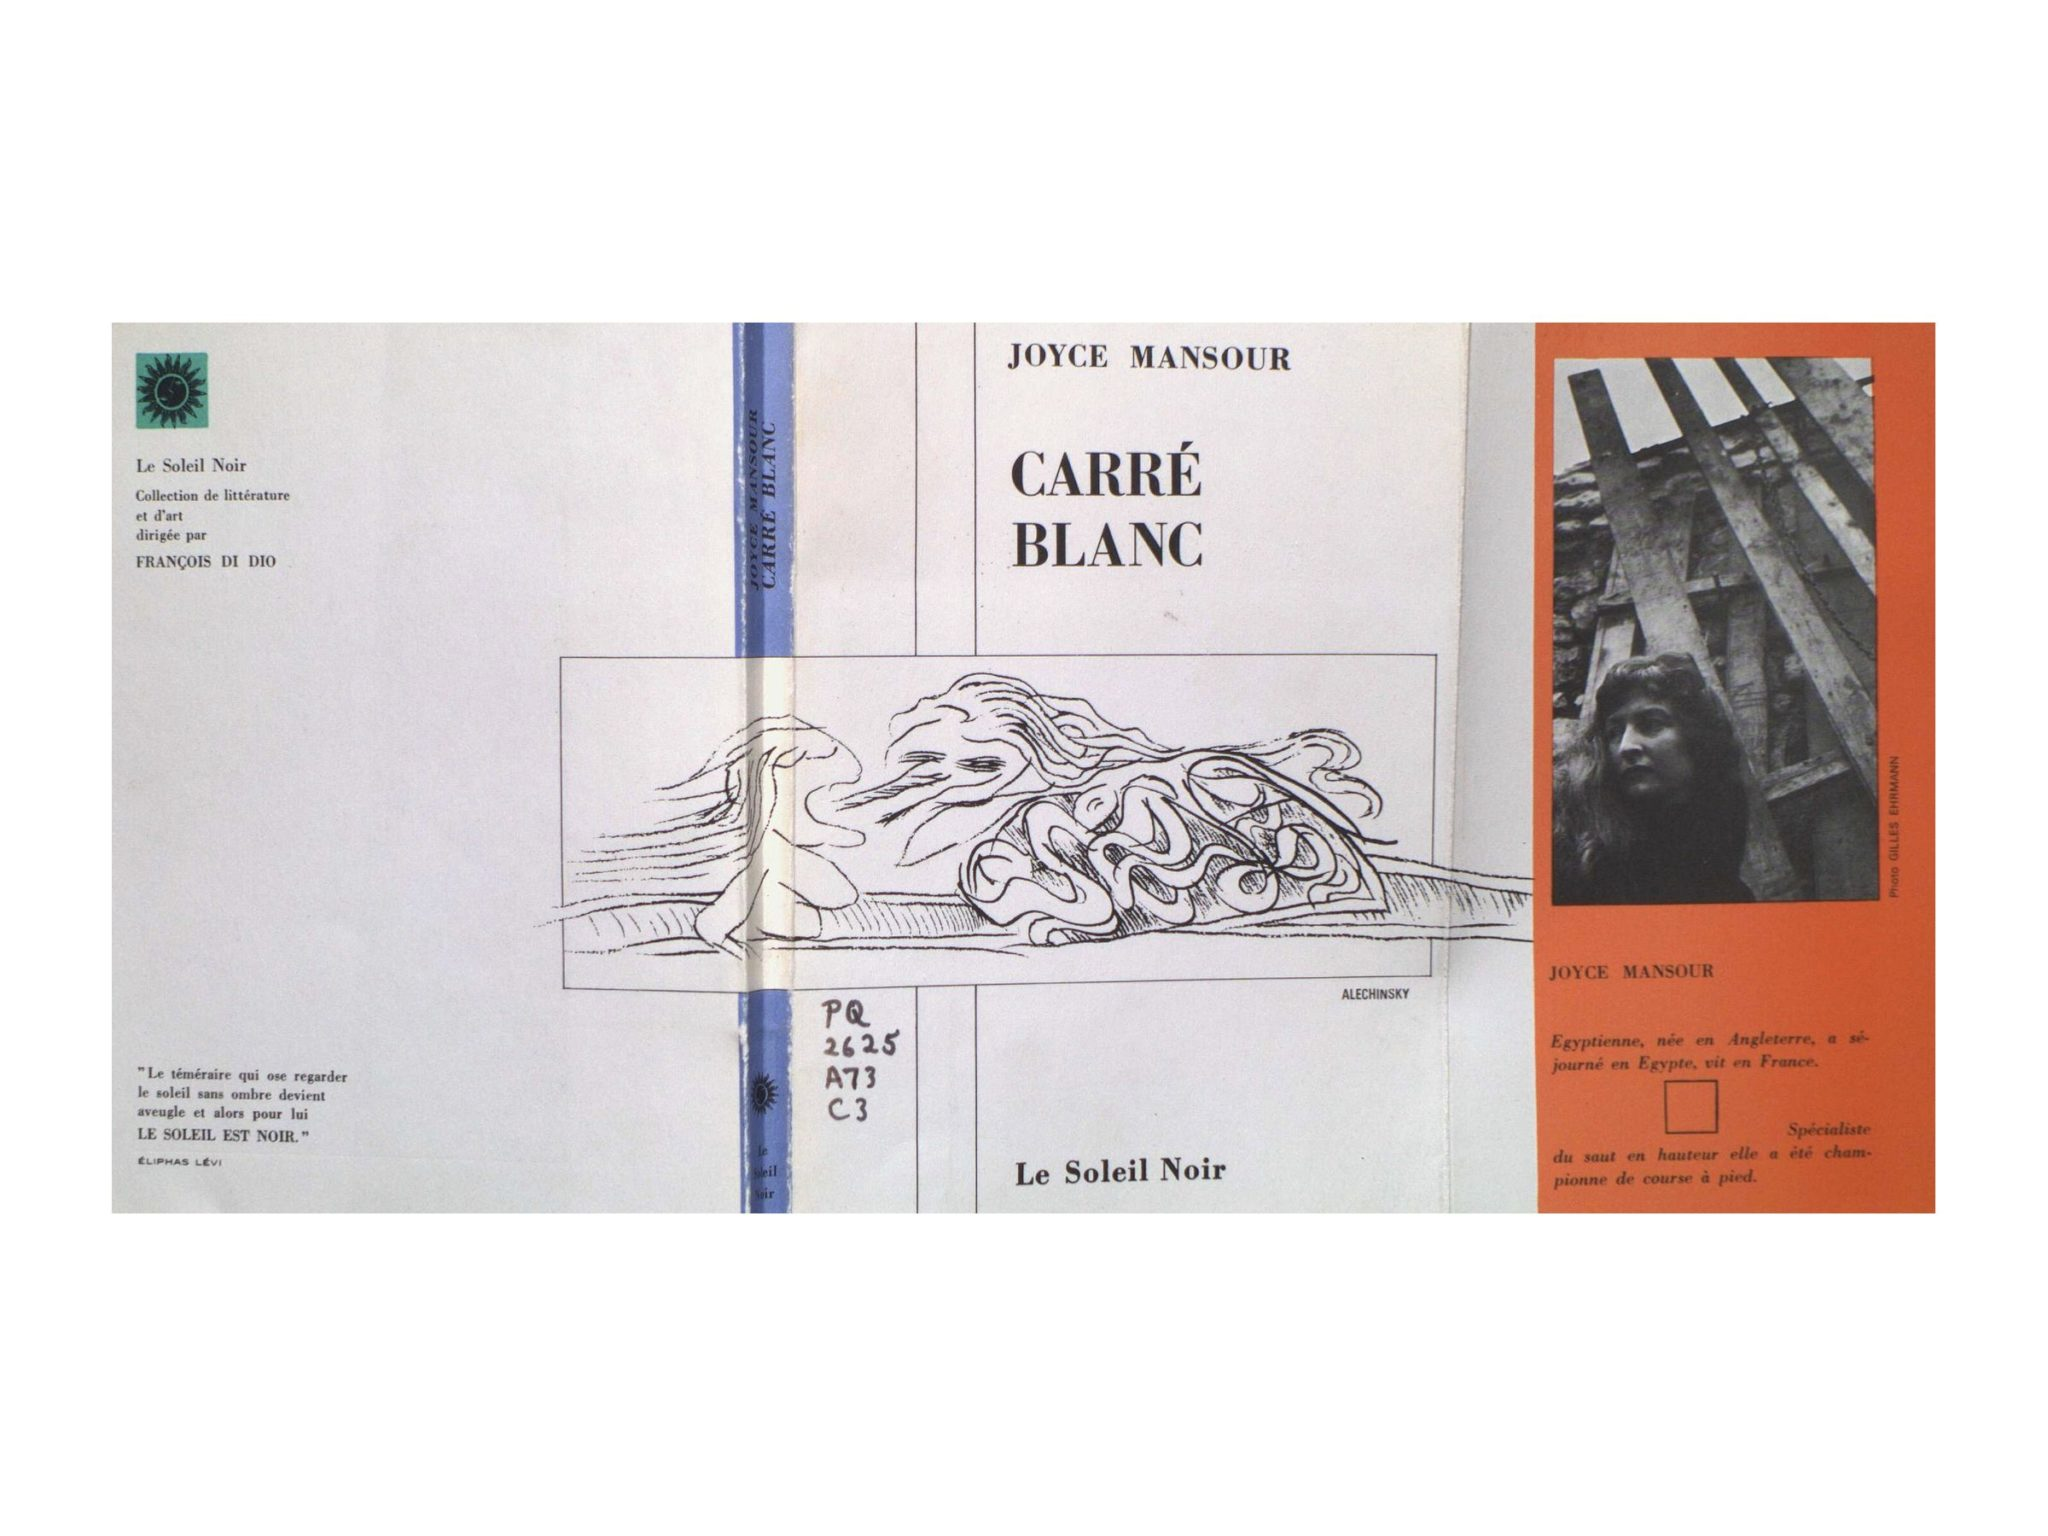 Carrousel-2-Mansour-Joyce_Carre-blanc